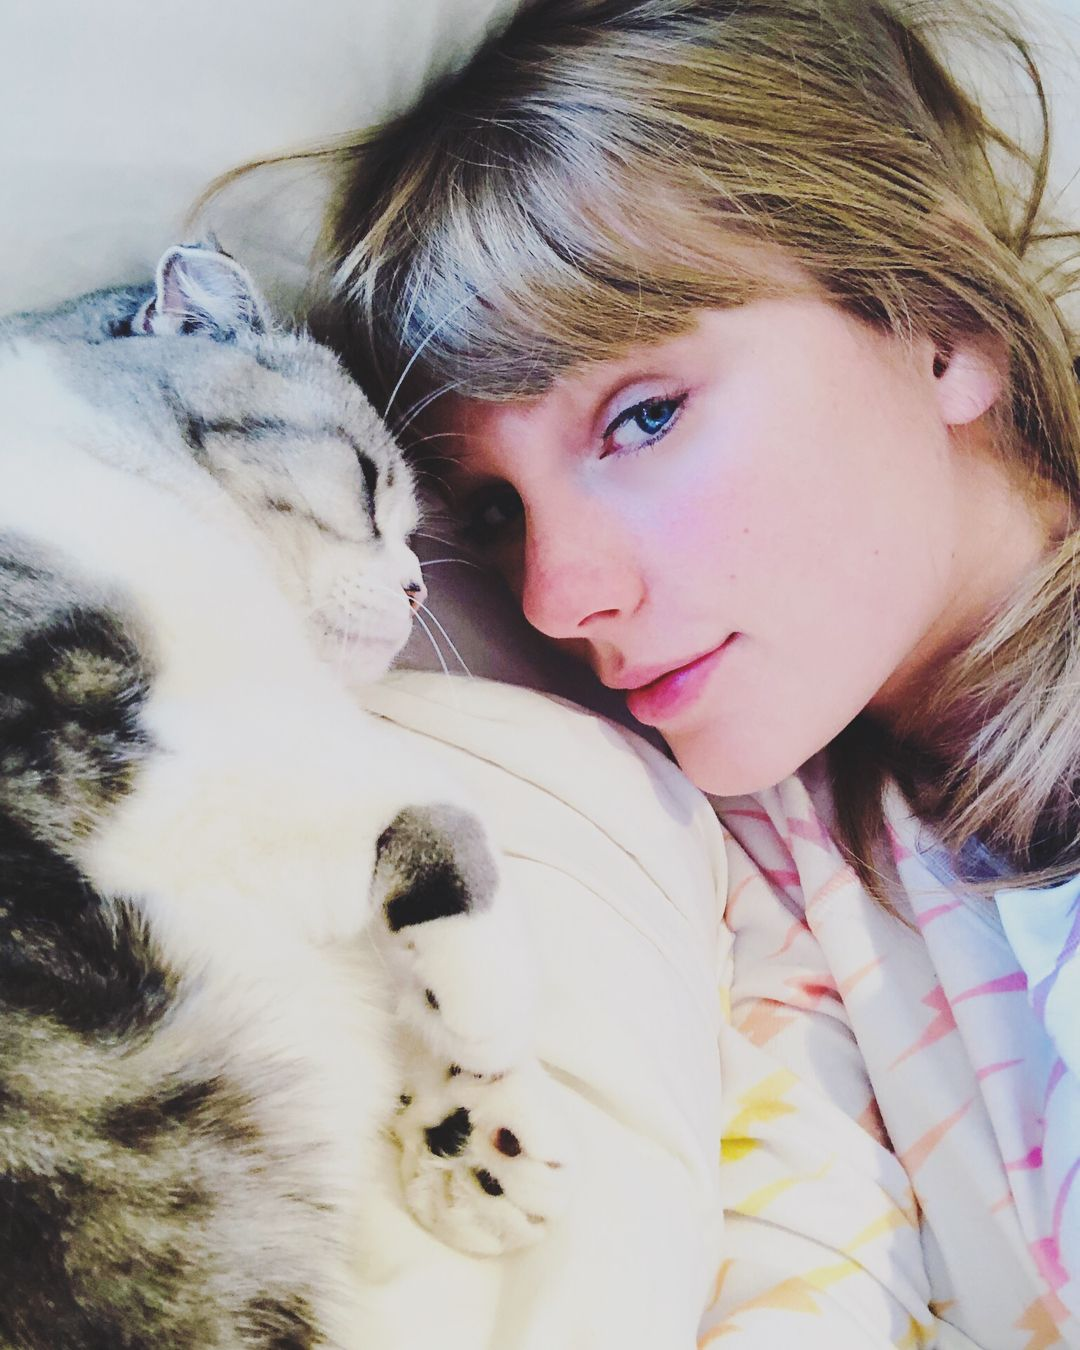 Instagram Photo by Taylor Swift (taylorswift